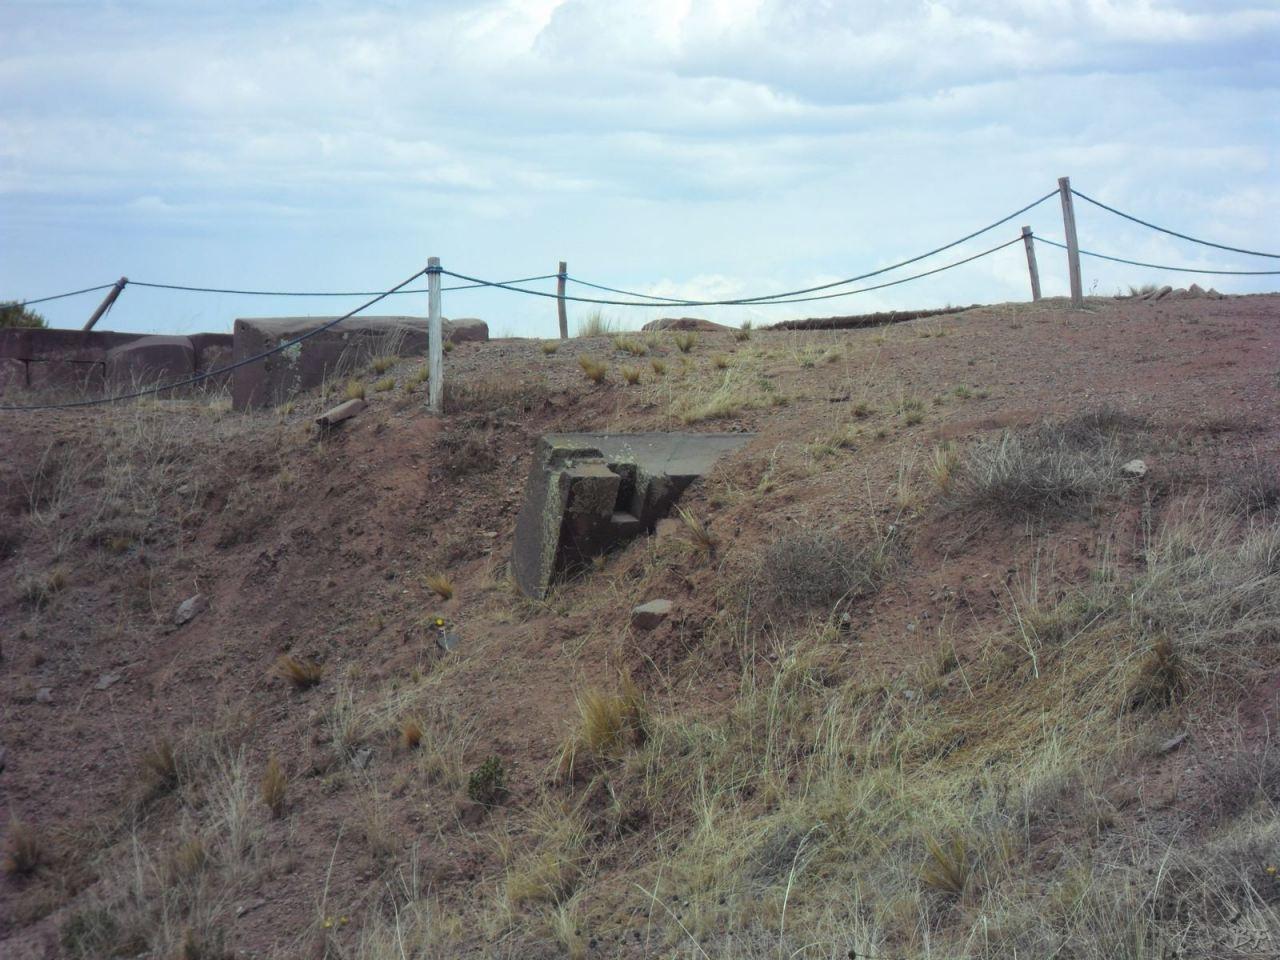 Sito-Megalitico-Piramide-Akapana-Kalasasaya-Menhir-Tiahuanaco-Bolivia-135